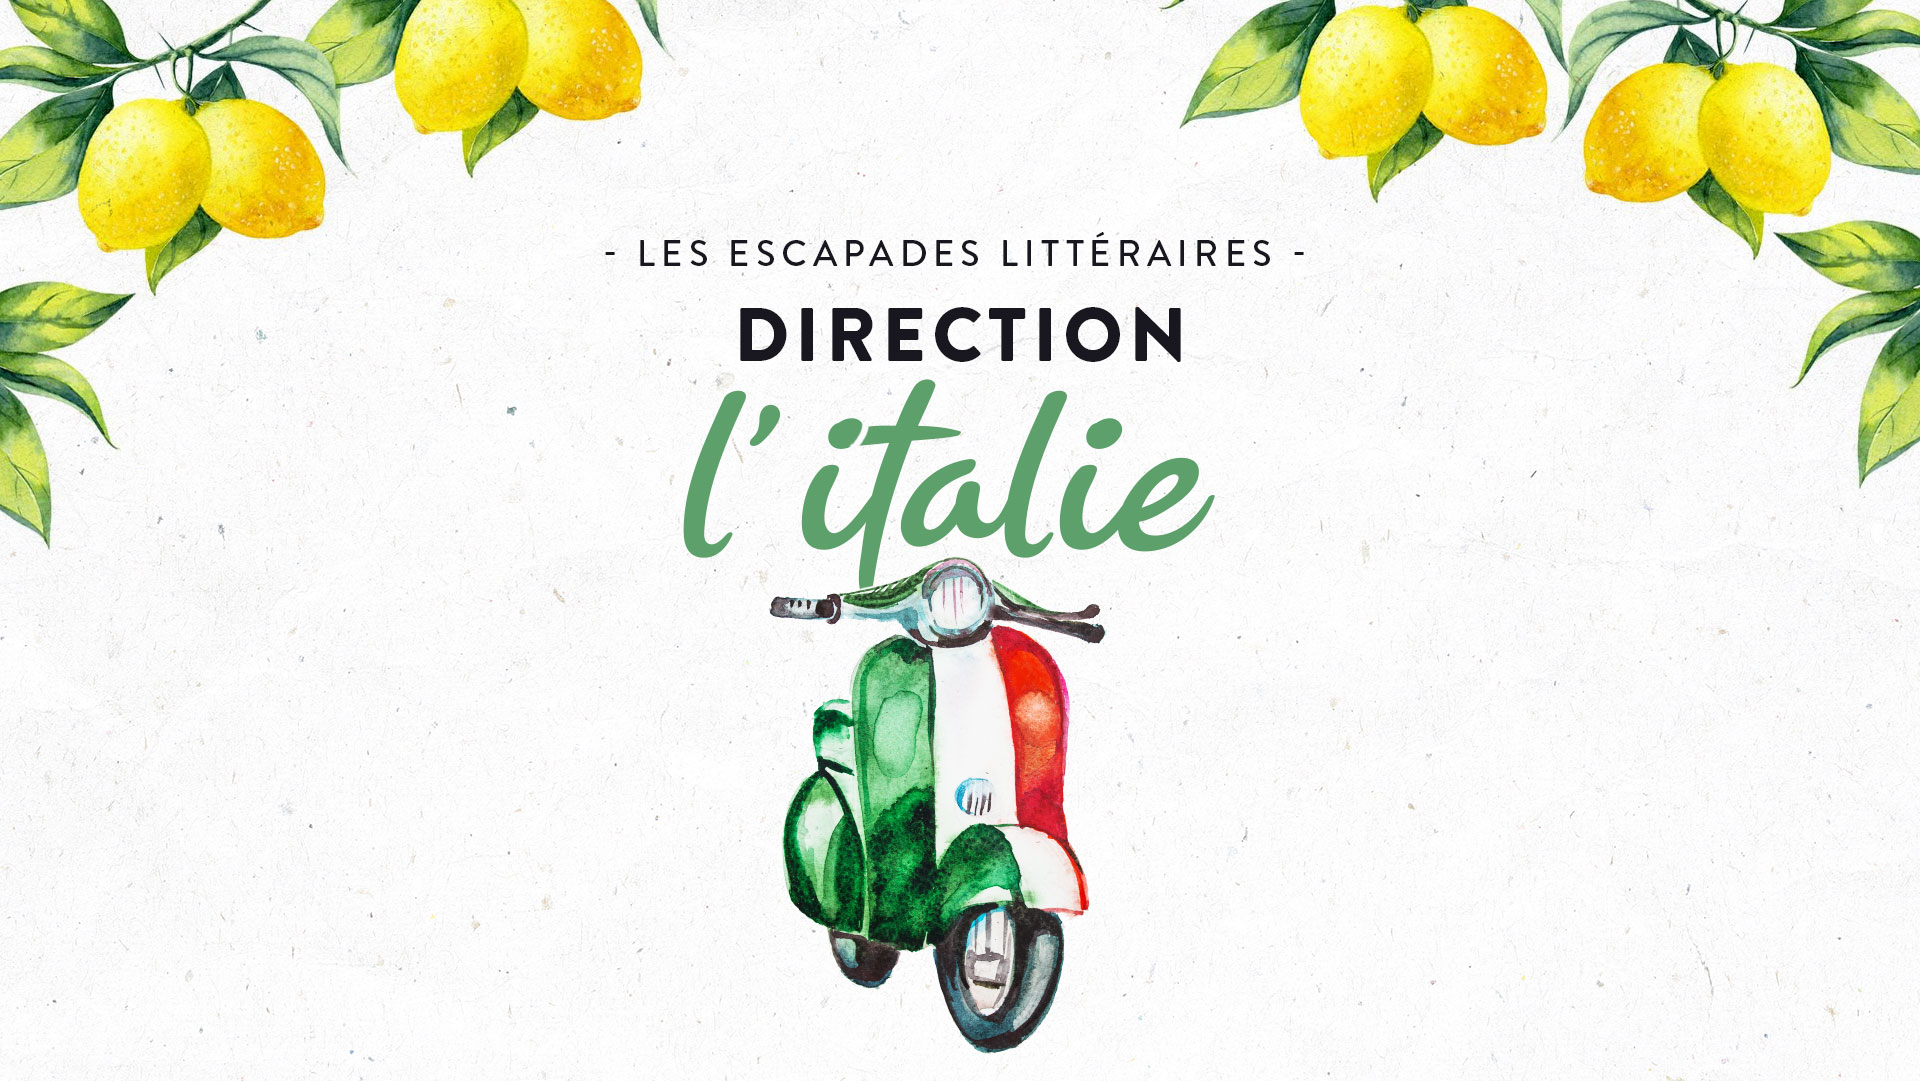 Les escapades litteraires Italie